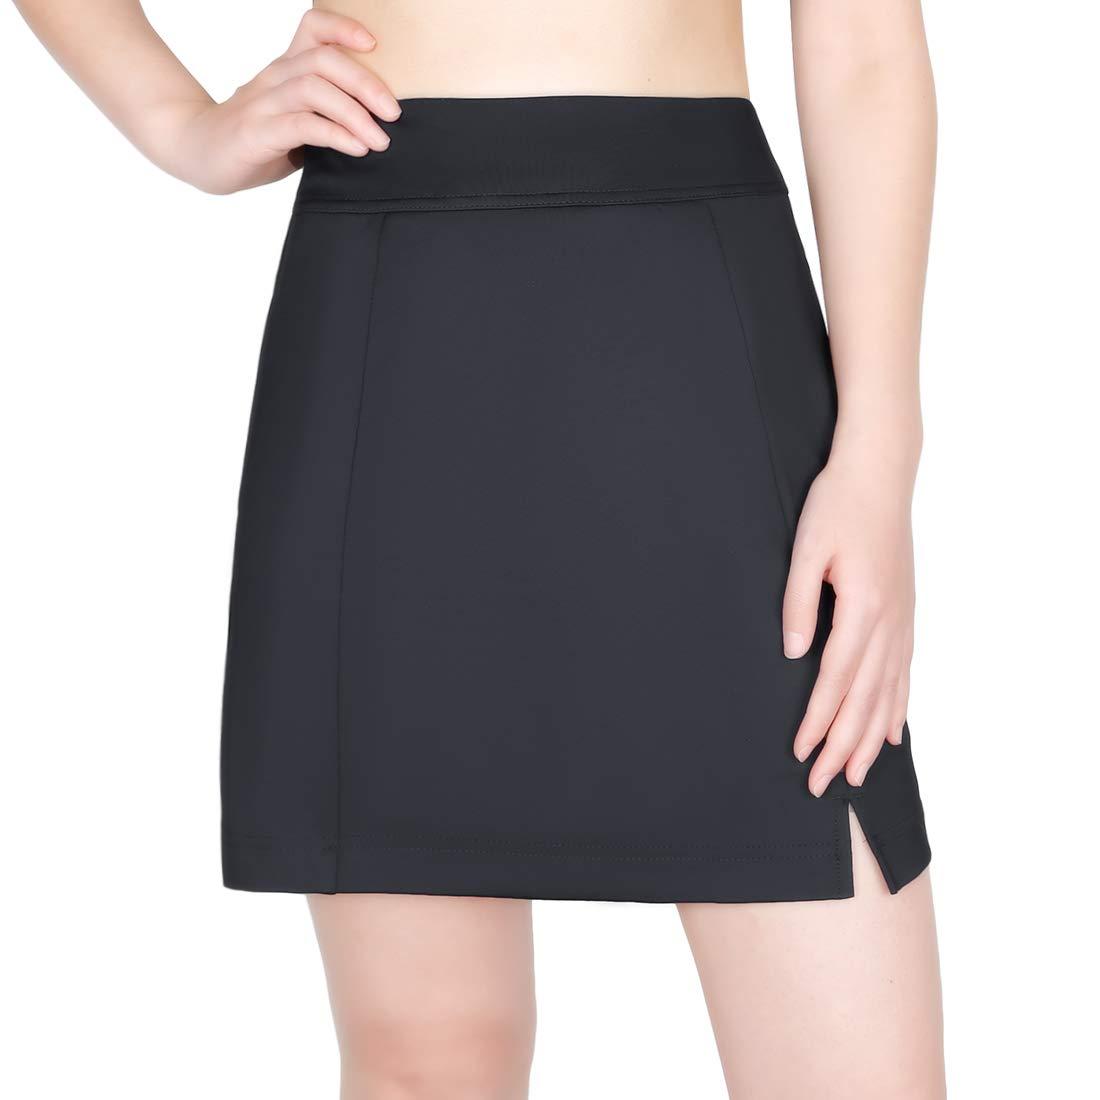 Lesmart Women's Tennis Skorts Lightweight Athletic Skirts Short with Pocket Golf Sports Workout Skorts